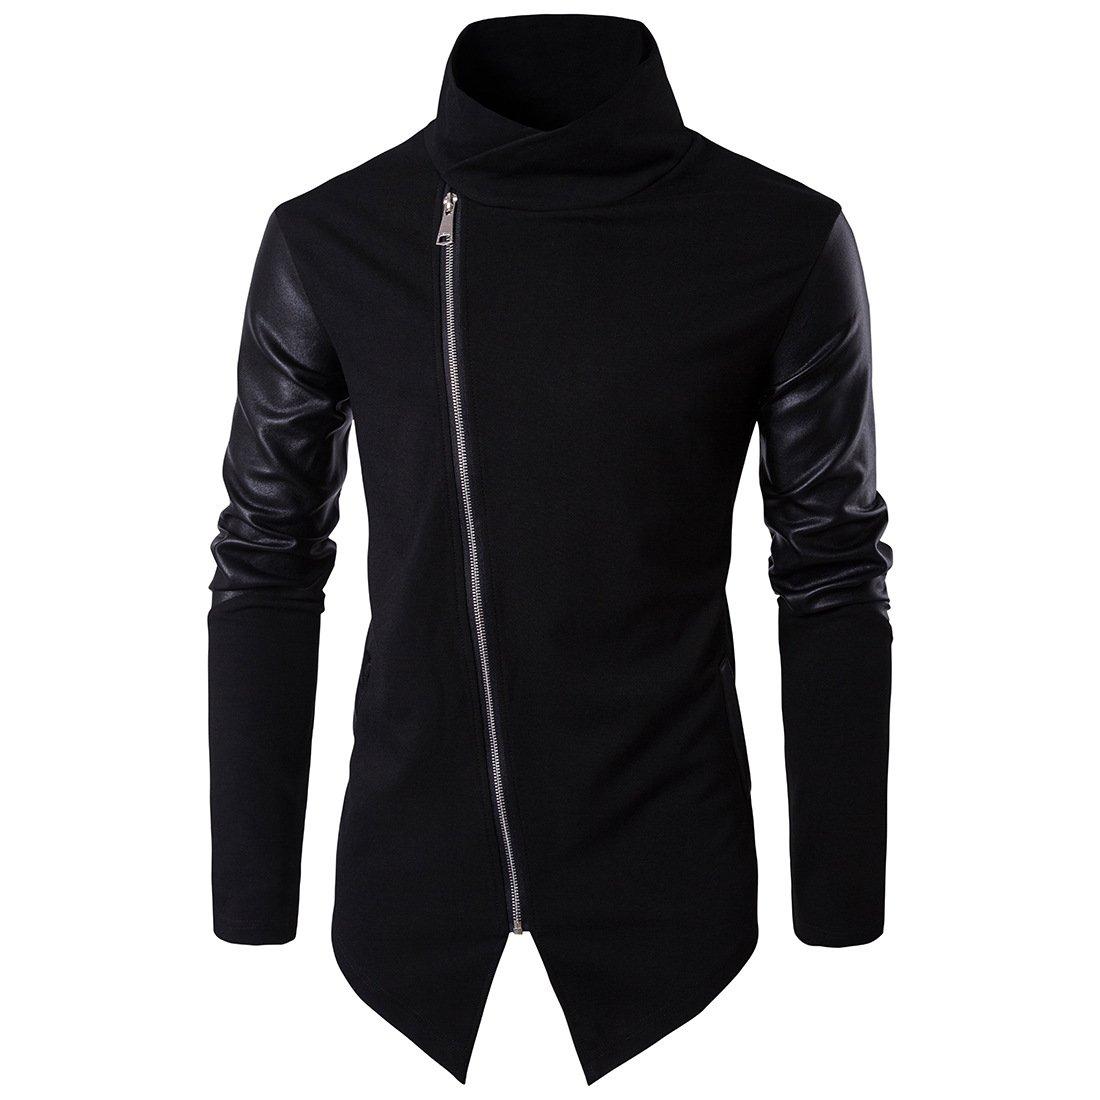 Tristin Men's Casual Jacket Zip Up Lightweight Turtleneck Asymmetrical Cotton Leather Long Sleeve Outwear Coat